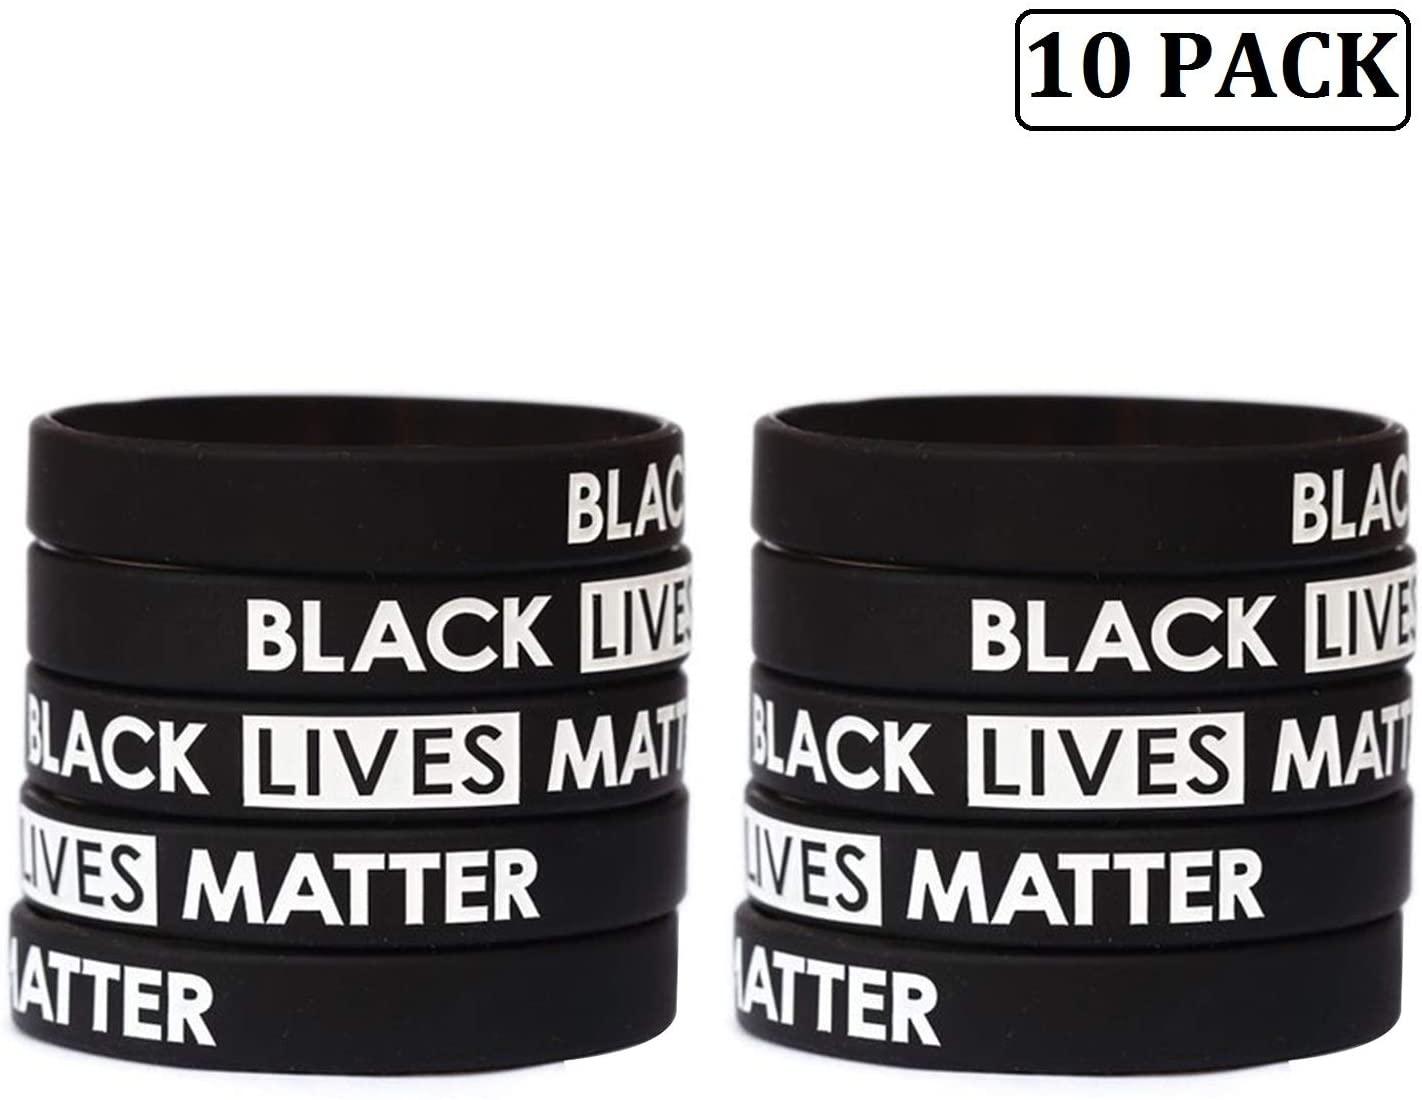 Black Lives Matter Wristband Bracelets Silicone Bracelet